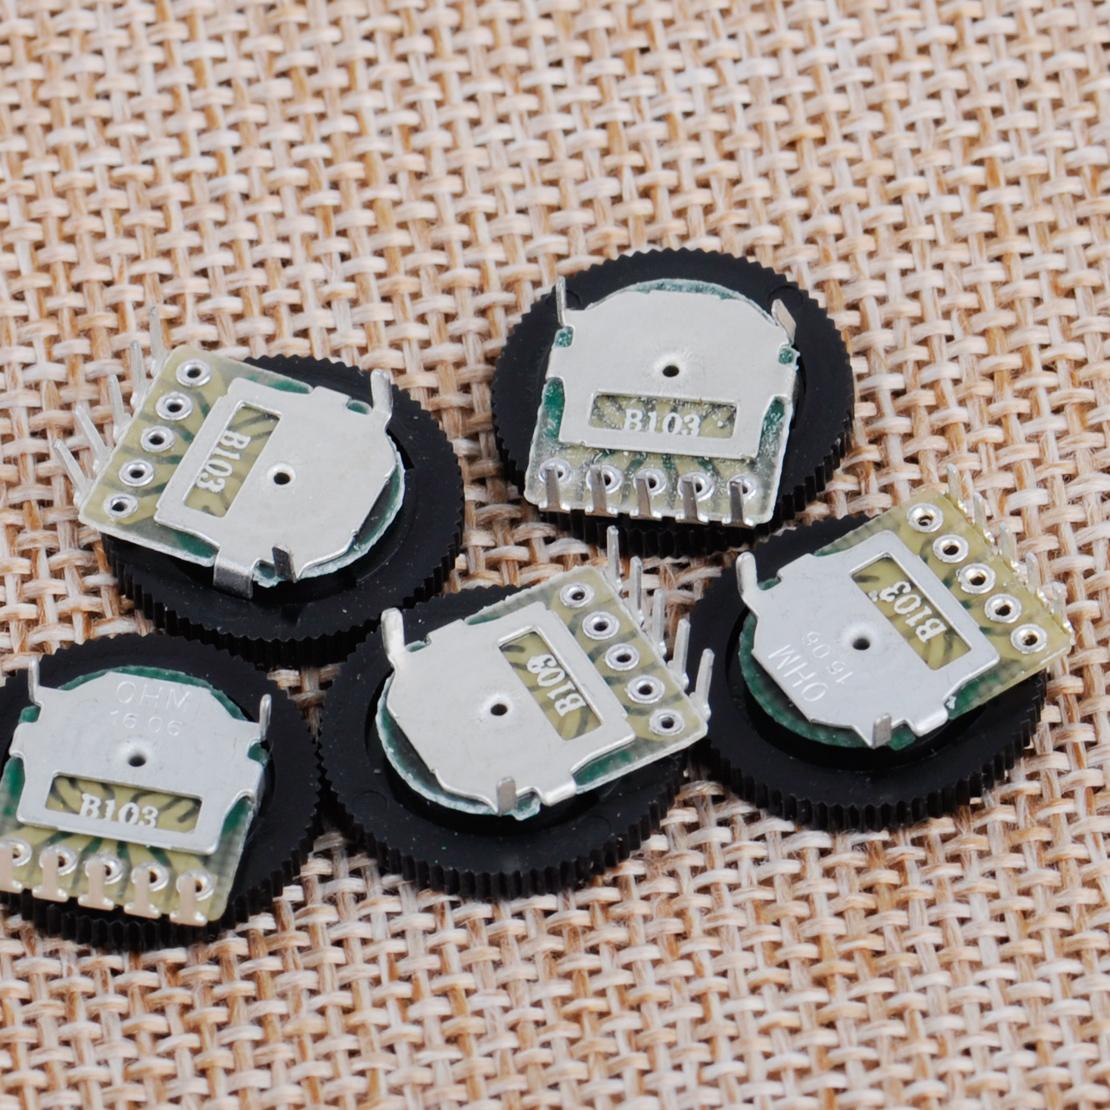 5 pcs Volume Dial Dual Wheel Duplex Potentiometer B103 10K Radio 2 Channel Stere